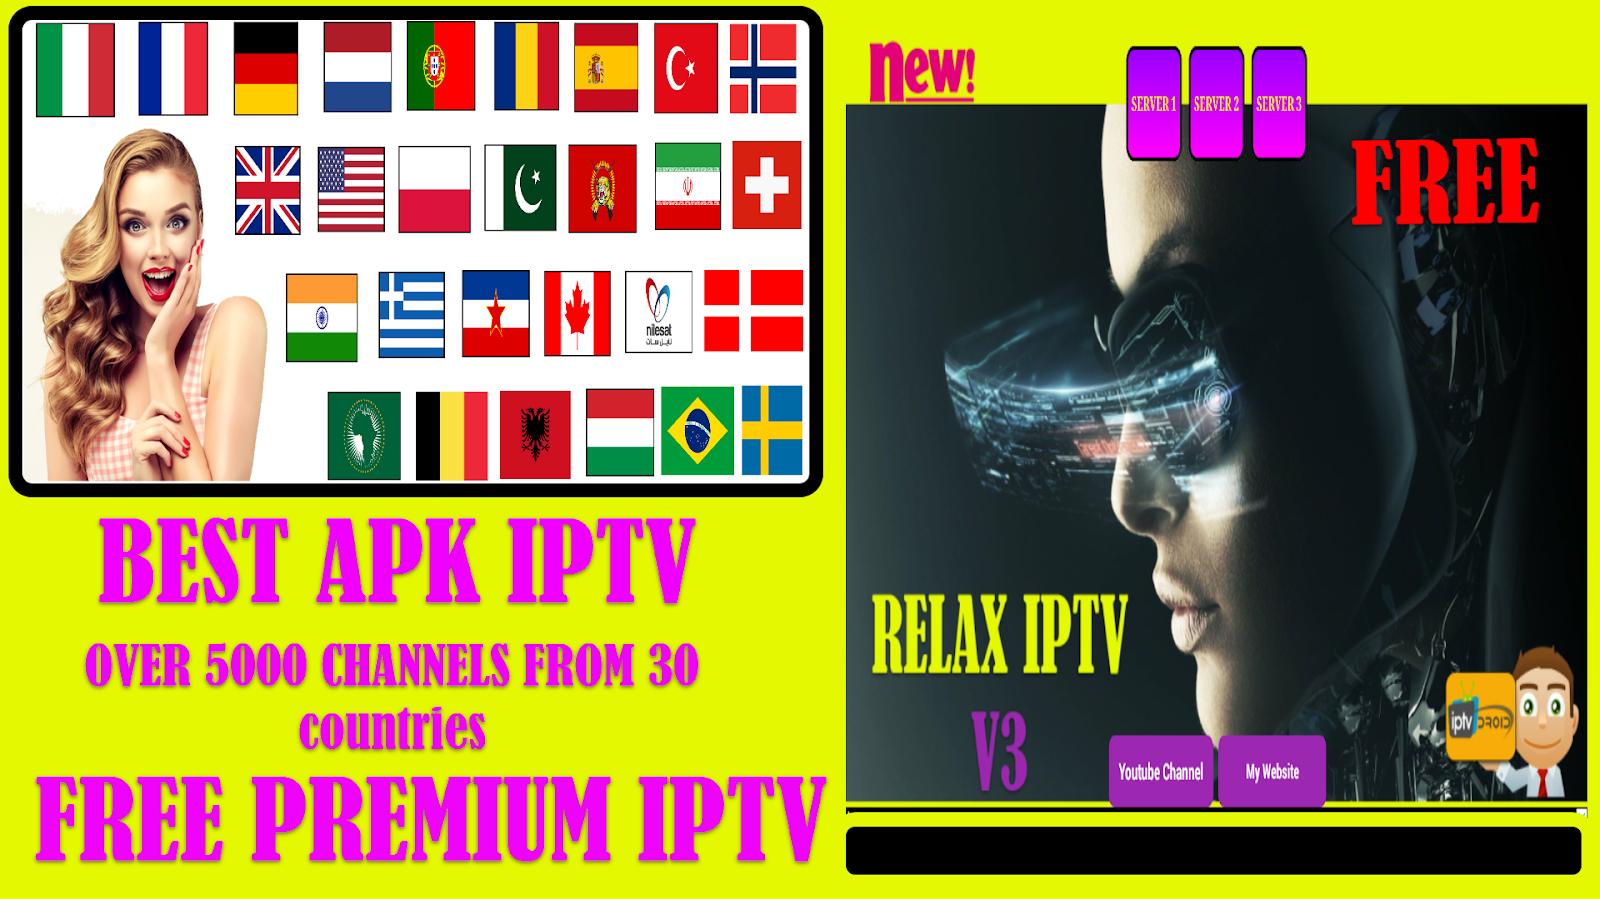 RELAX IPTV V3 = BEST APK TO WATCH PREMIUM CHANNELS - IPTV DROID